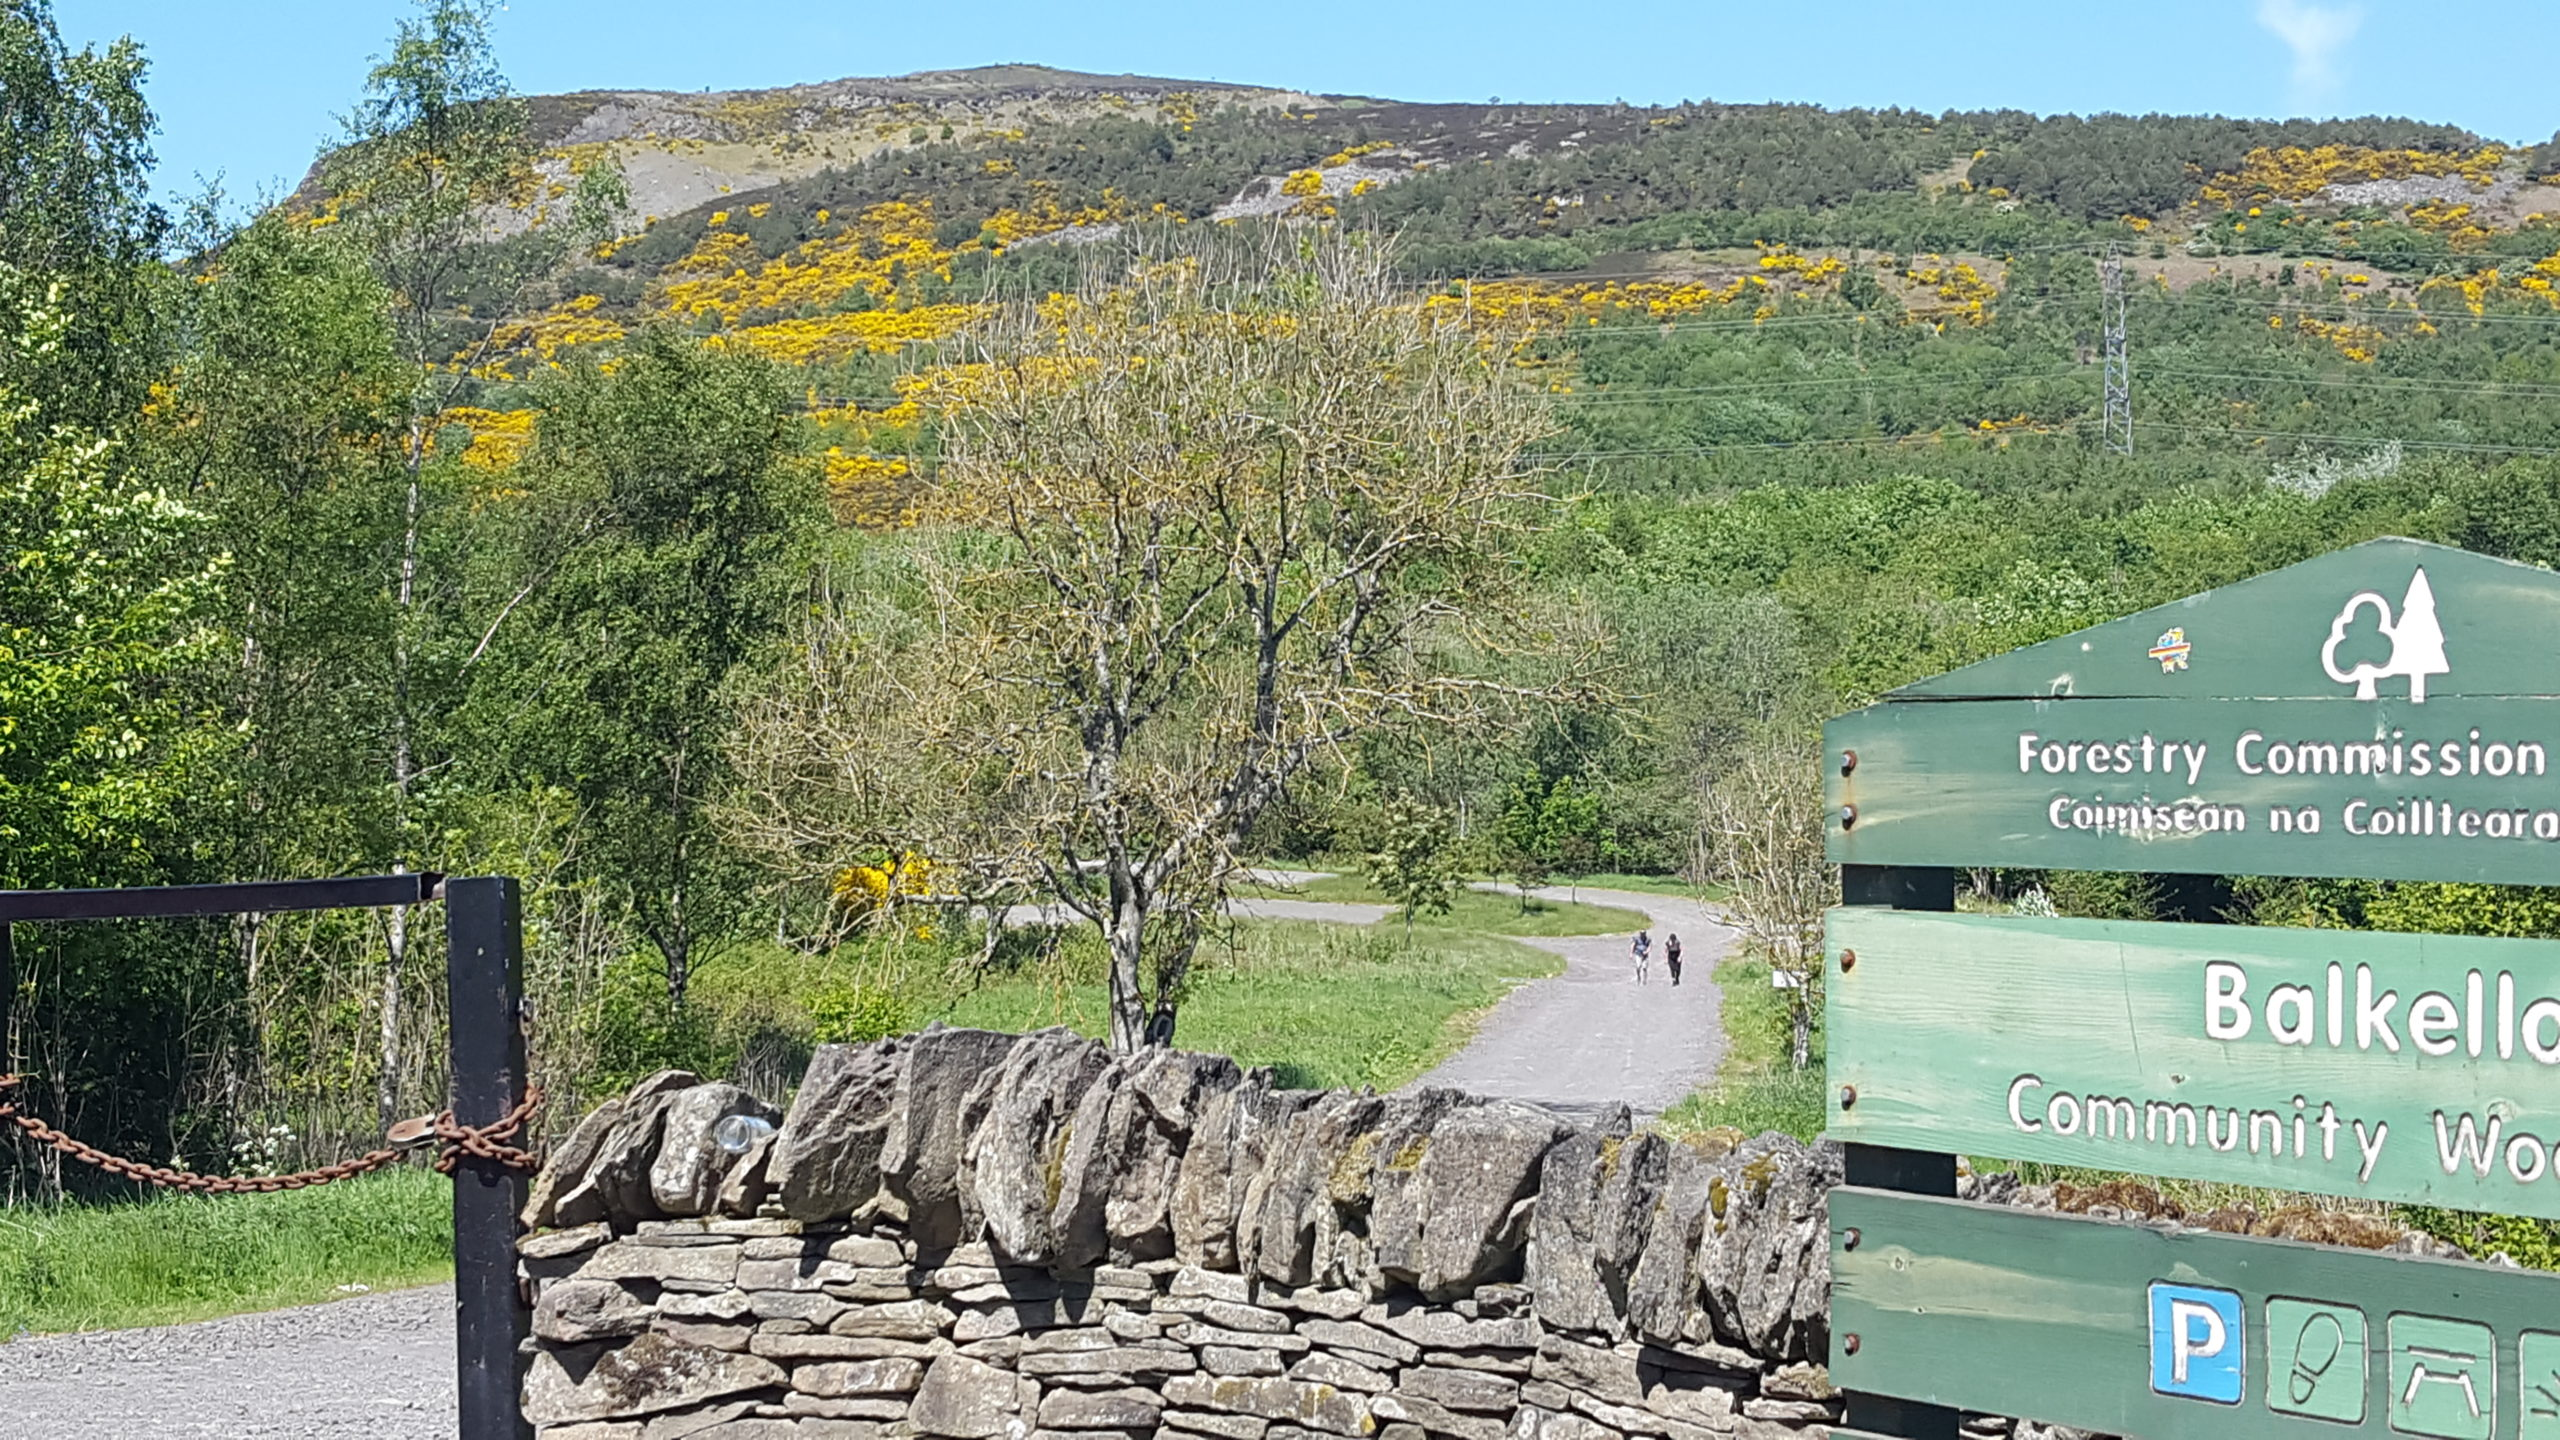 Balkello Community Woodland near Dundee.